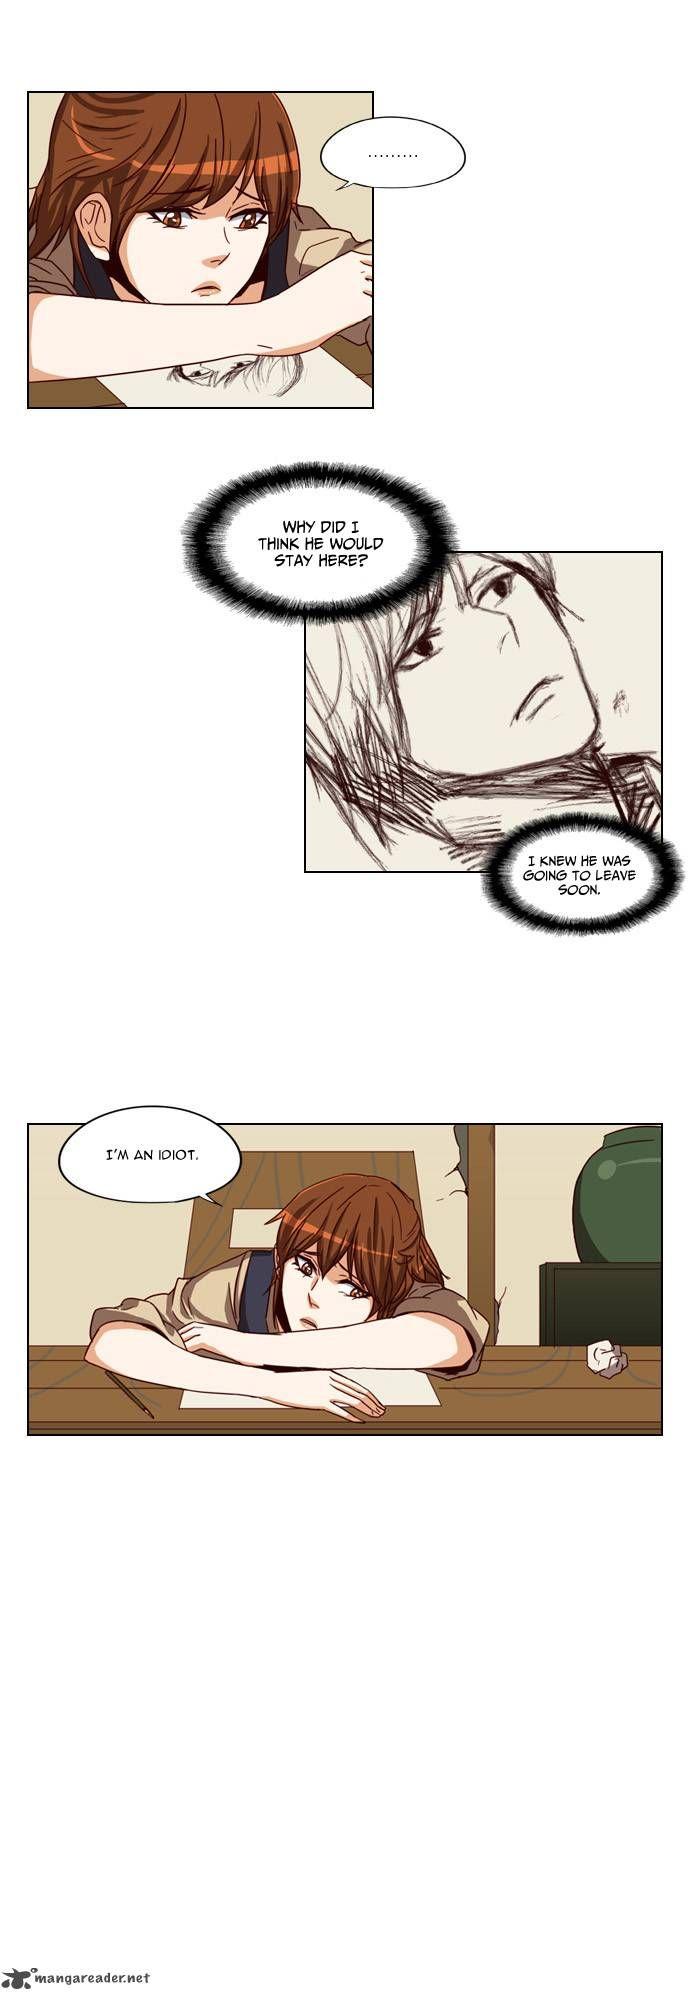 Serendipity 19 Page 2